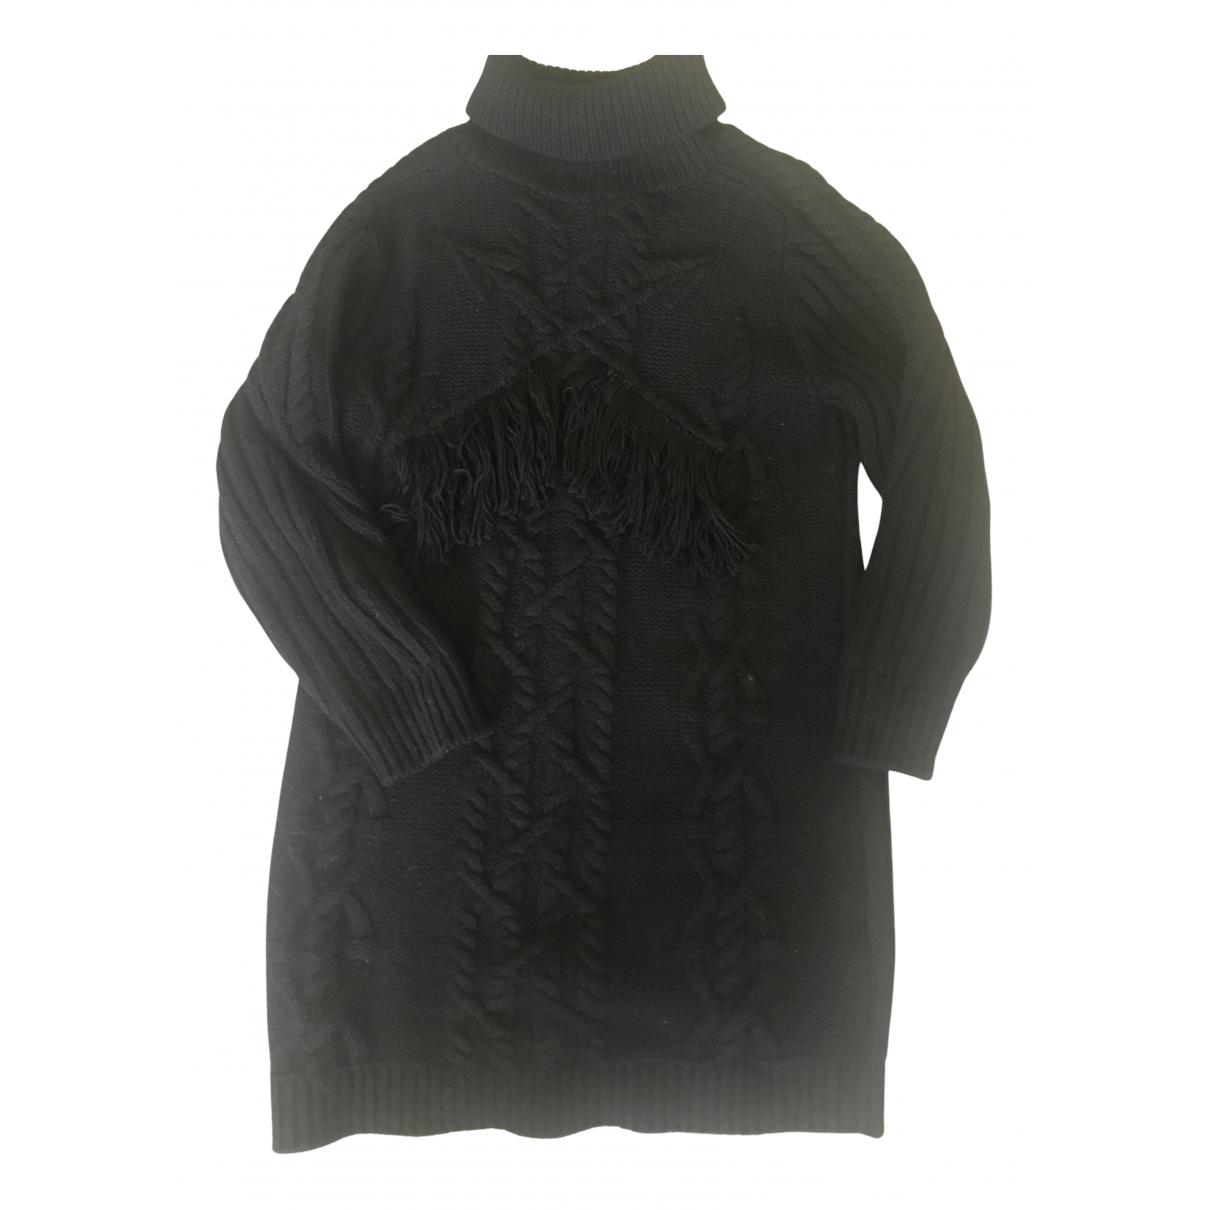 Claudie Pierlot N Black Wool dress for Women 36 FR